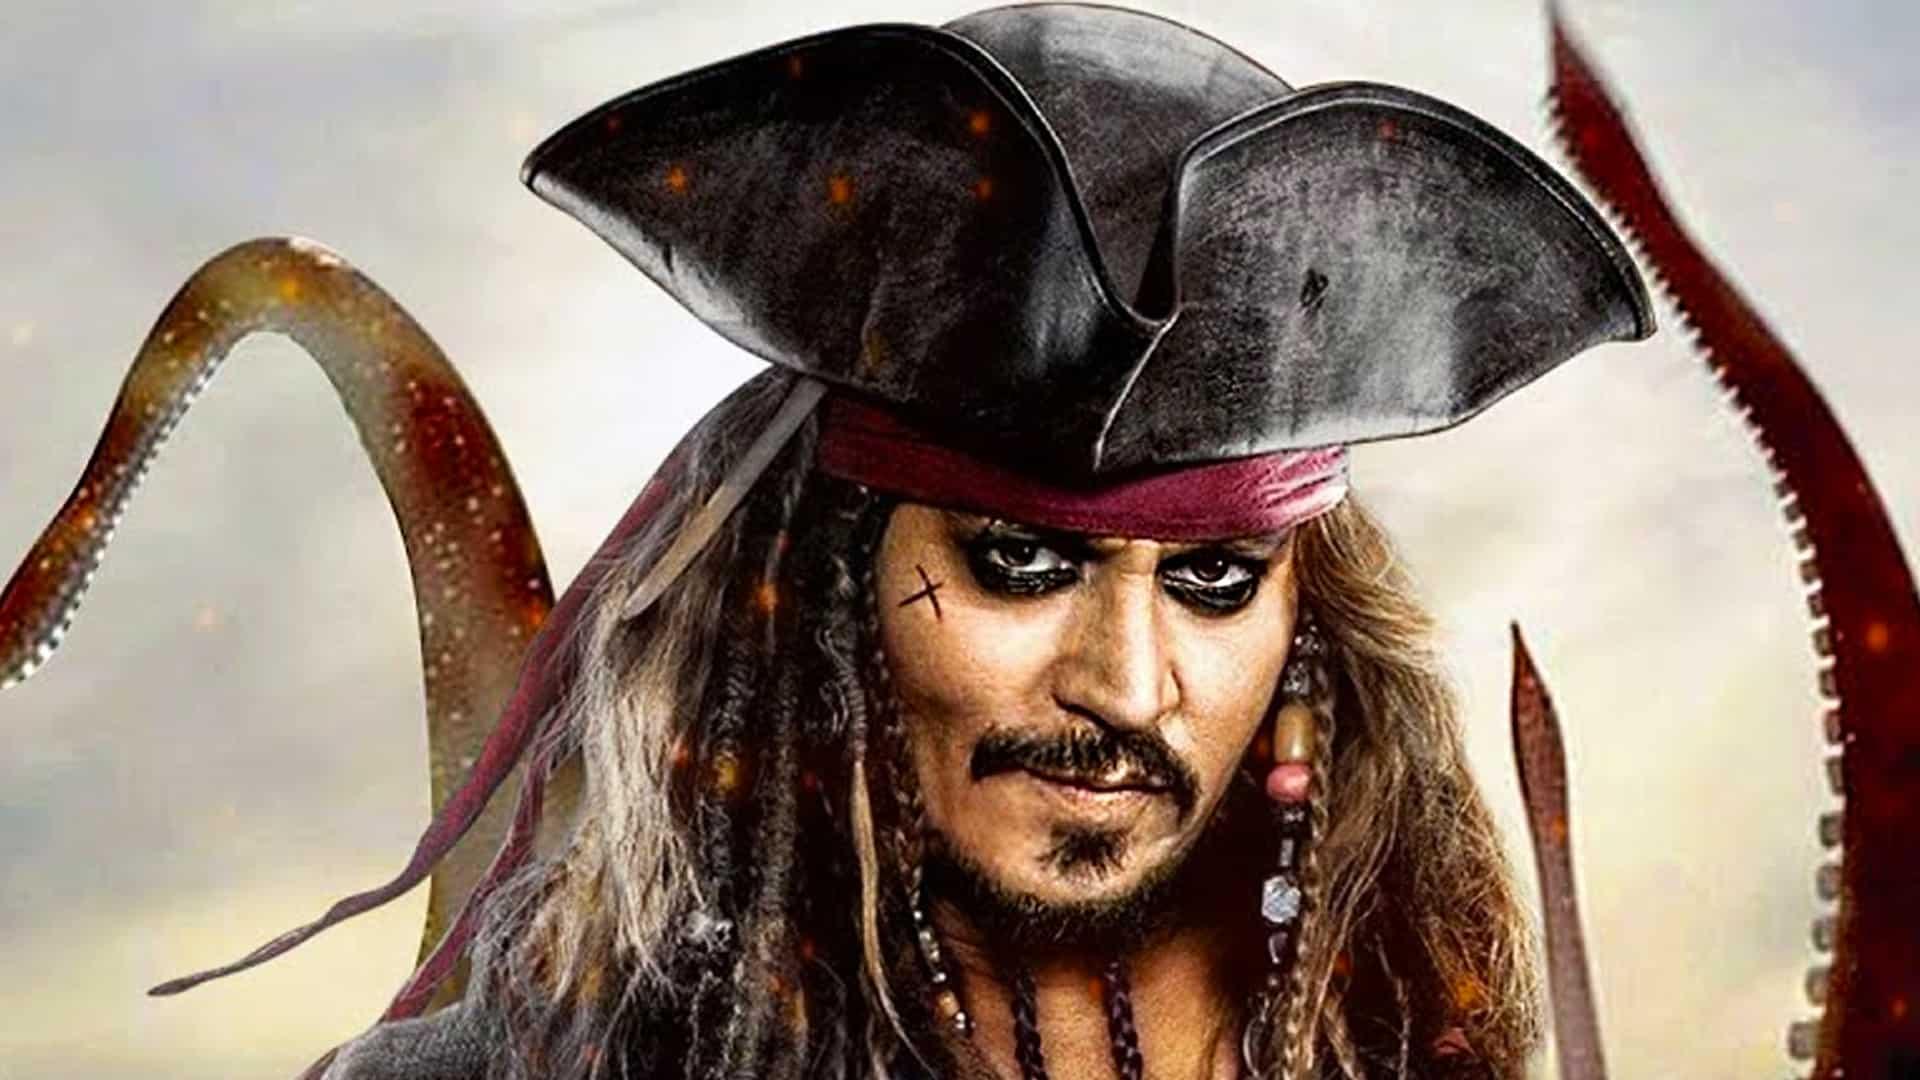 Piráti z Karibiku 6